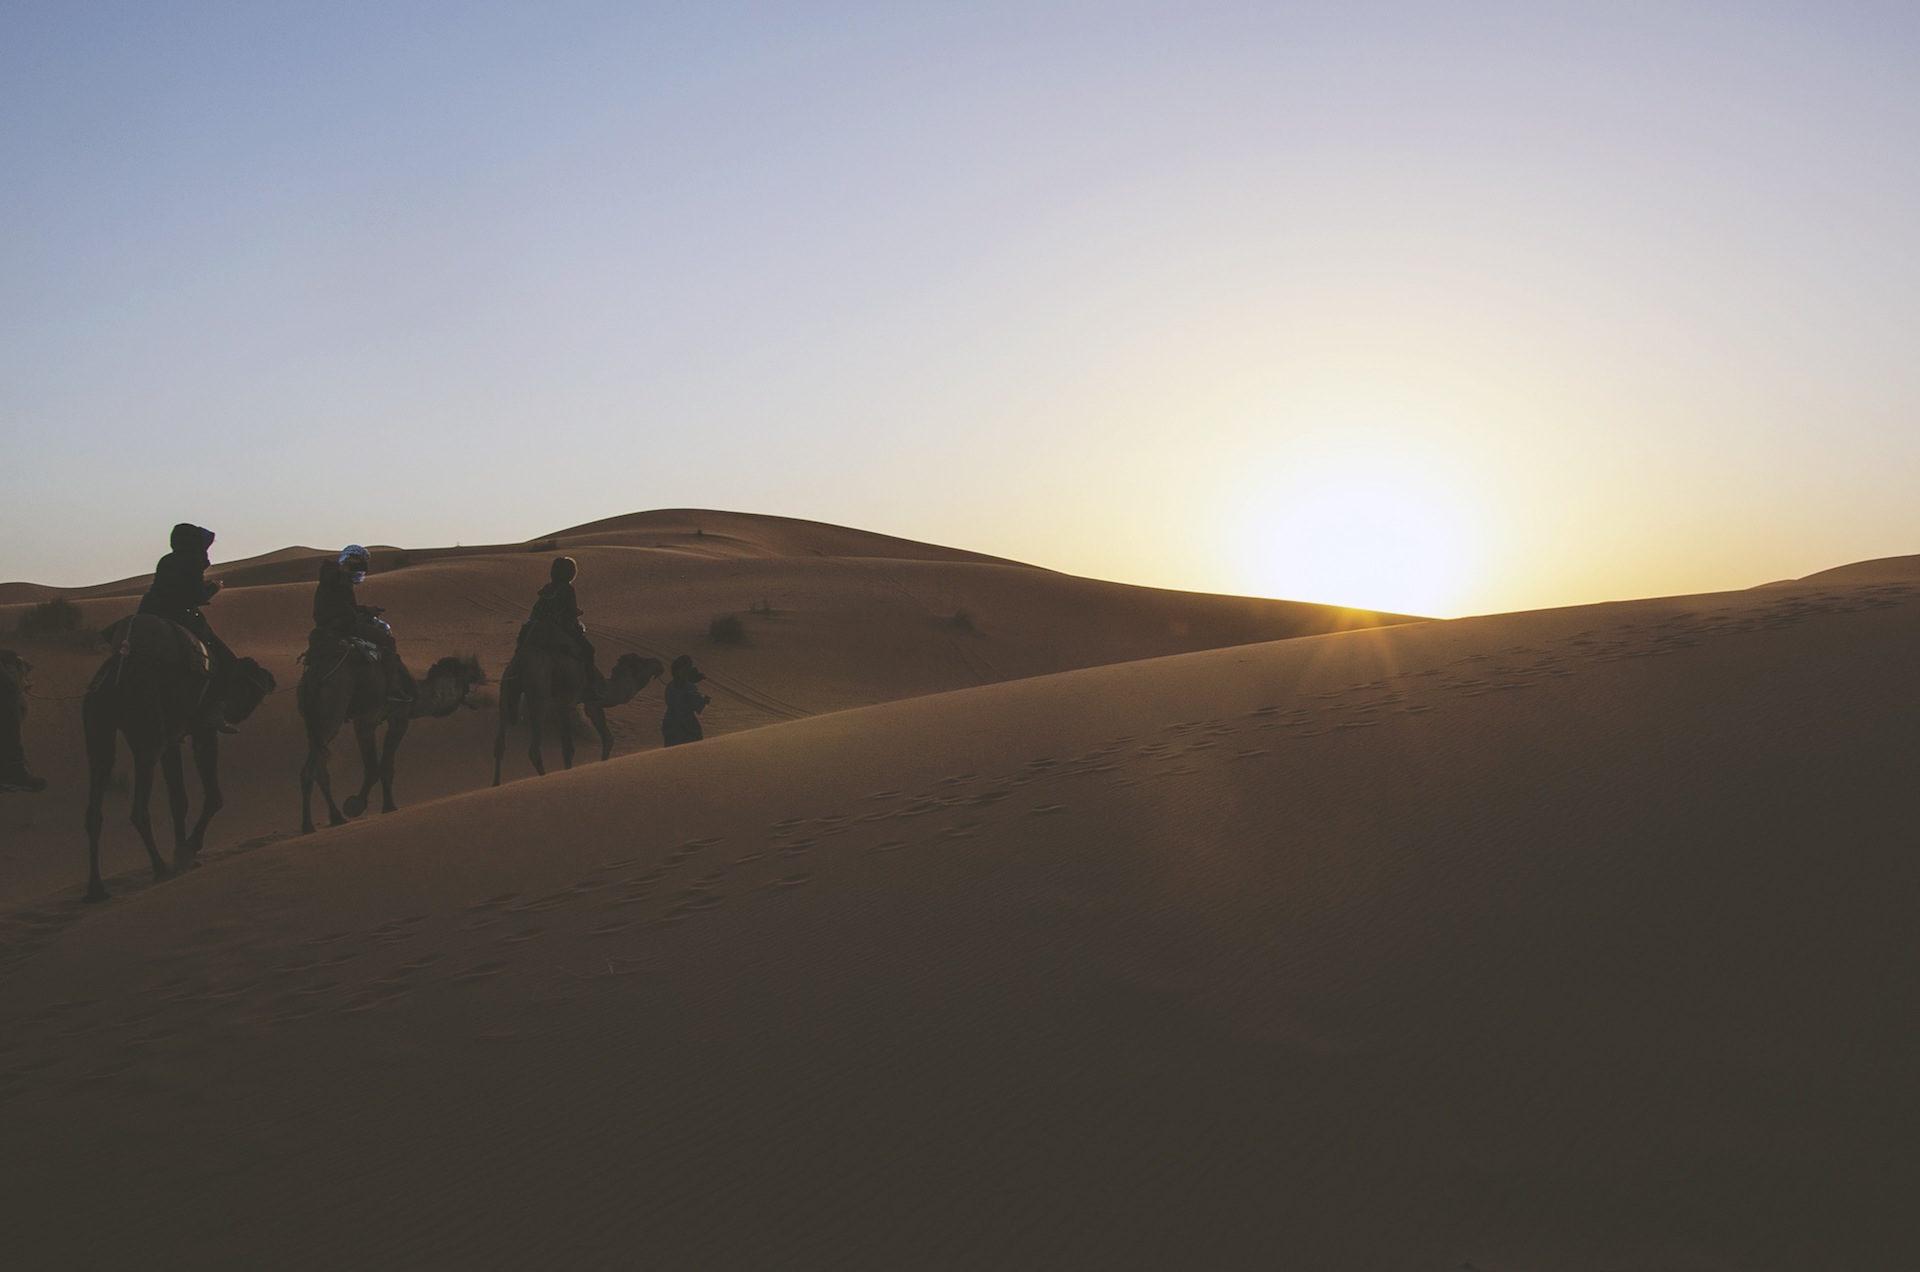 Wüste, Kamele, Sand, Fußstapfen, ,Sonne - Wallpaper HD - Prof.-falken.com